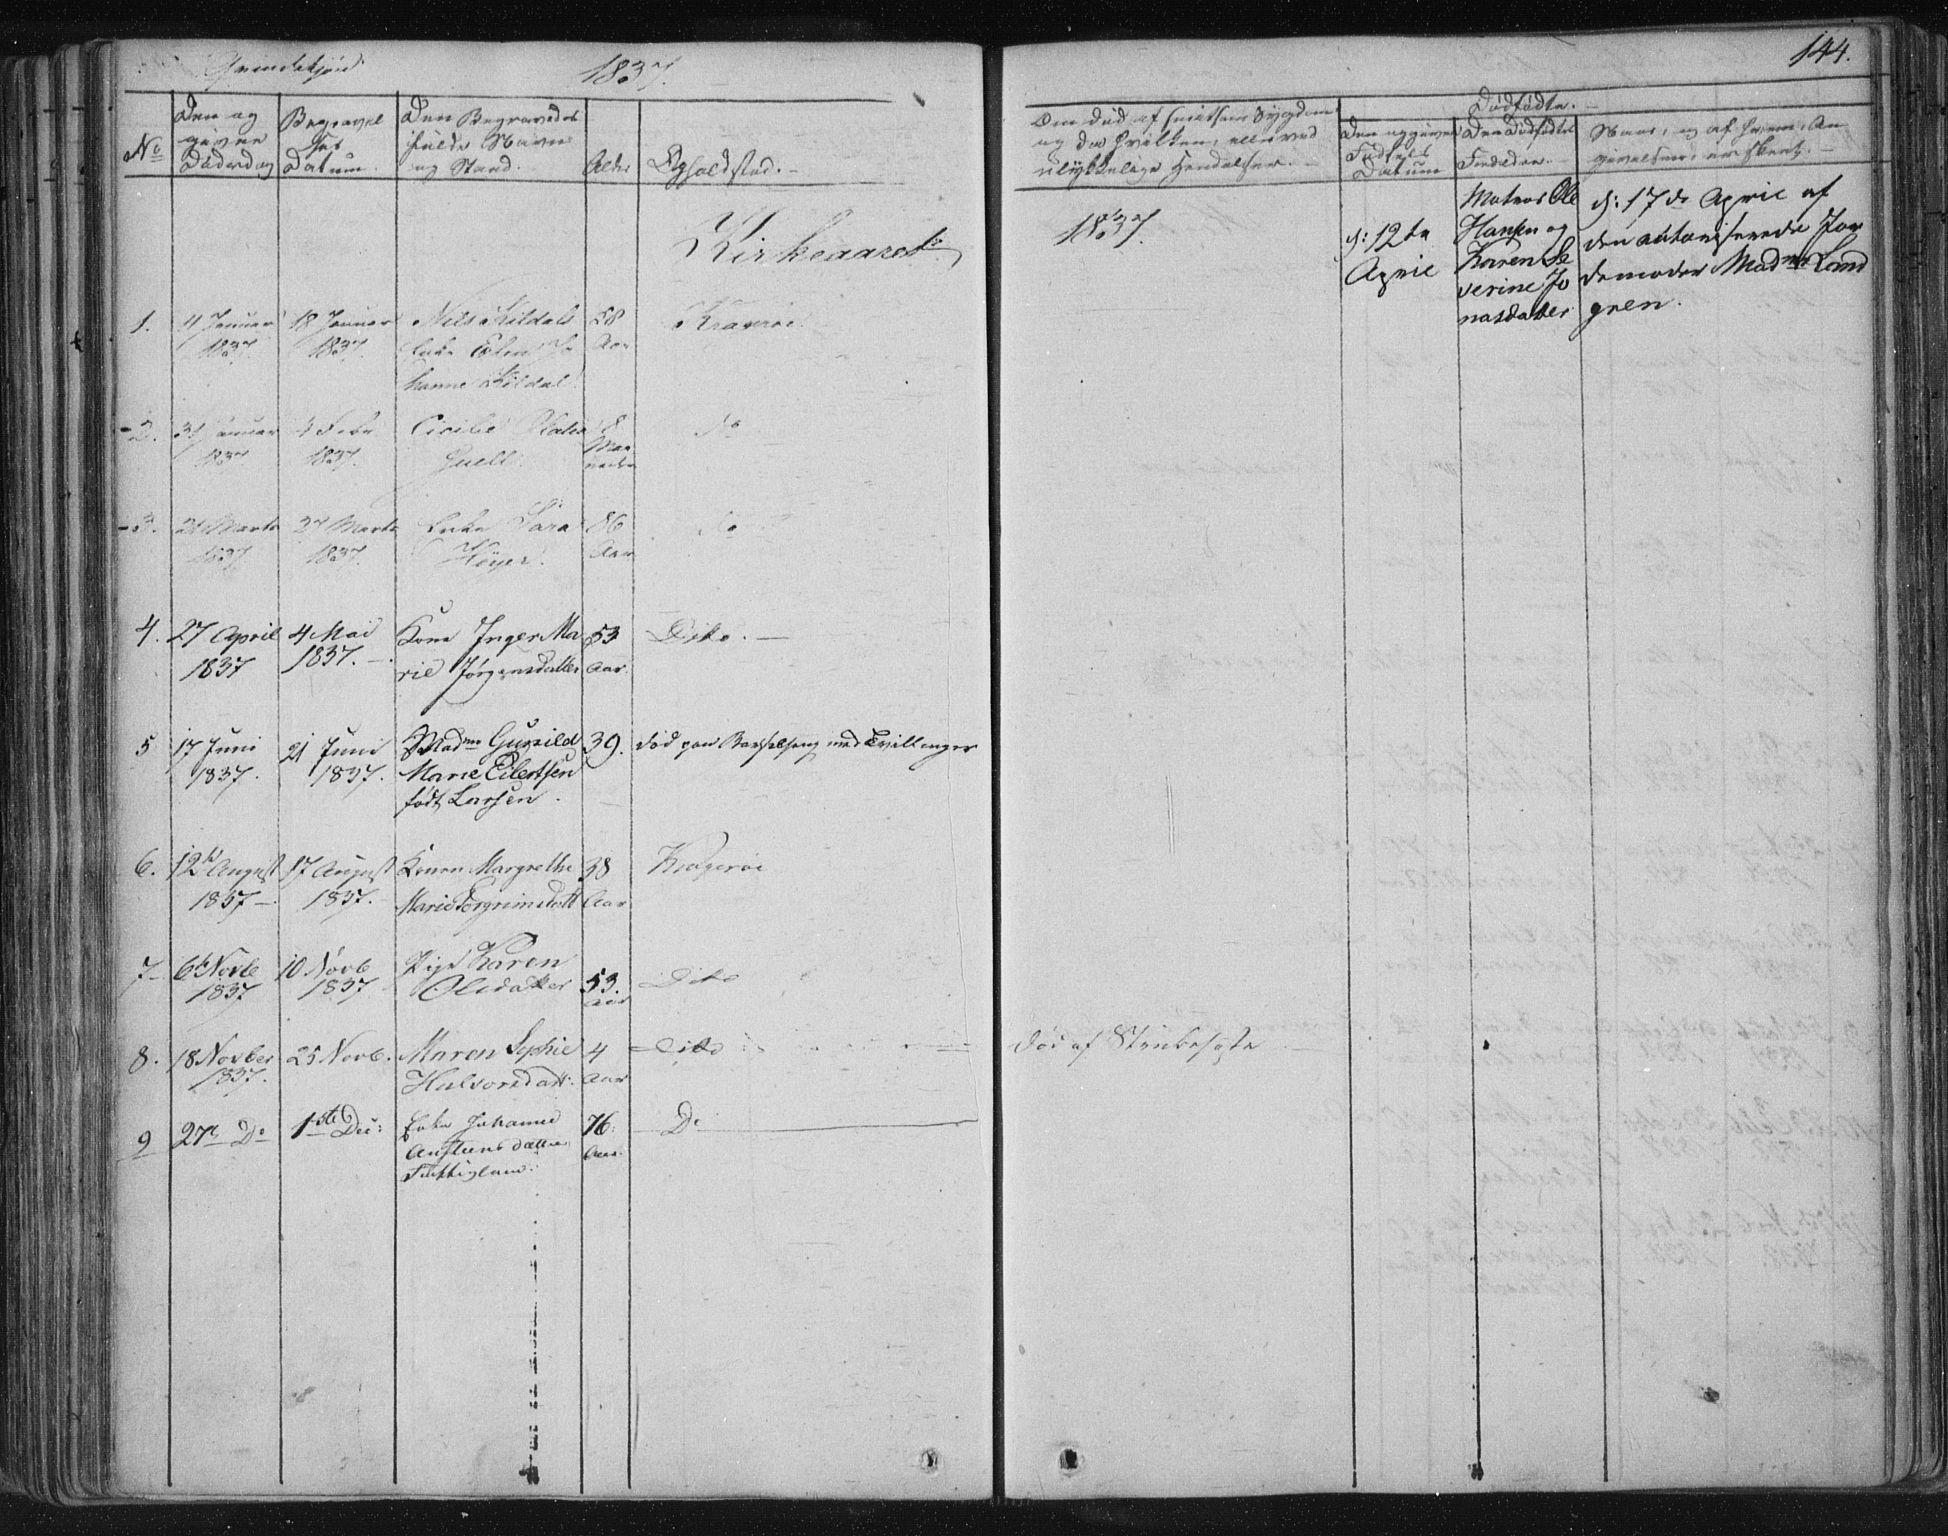 SAKO, Kragerø kirkebøker, F/Fa/L0005: Ministerialbok nr. 5, 1832-1847, s. 144